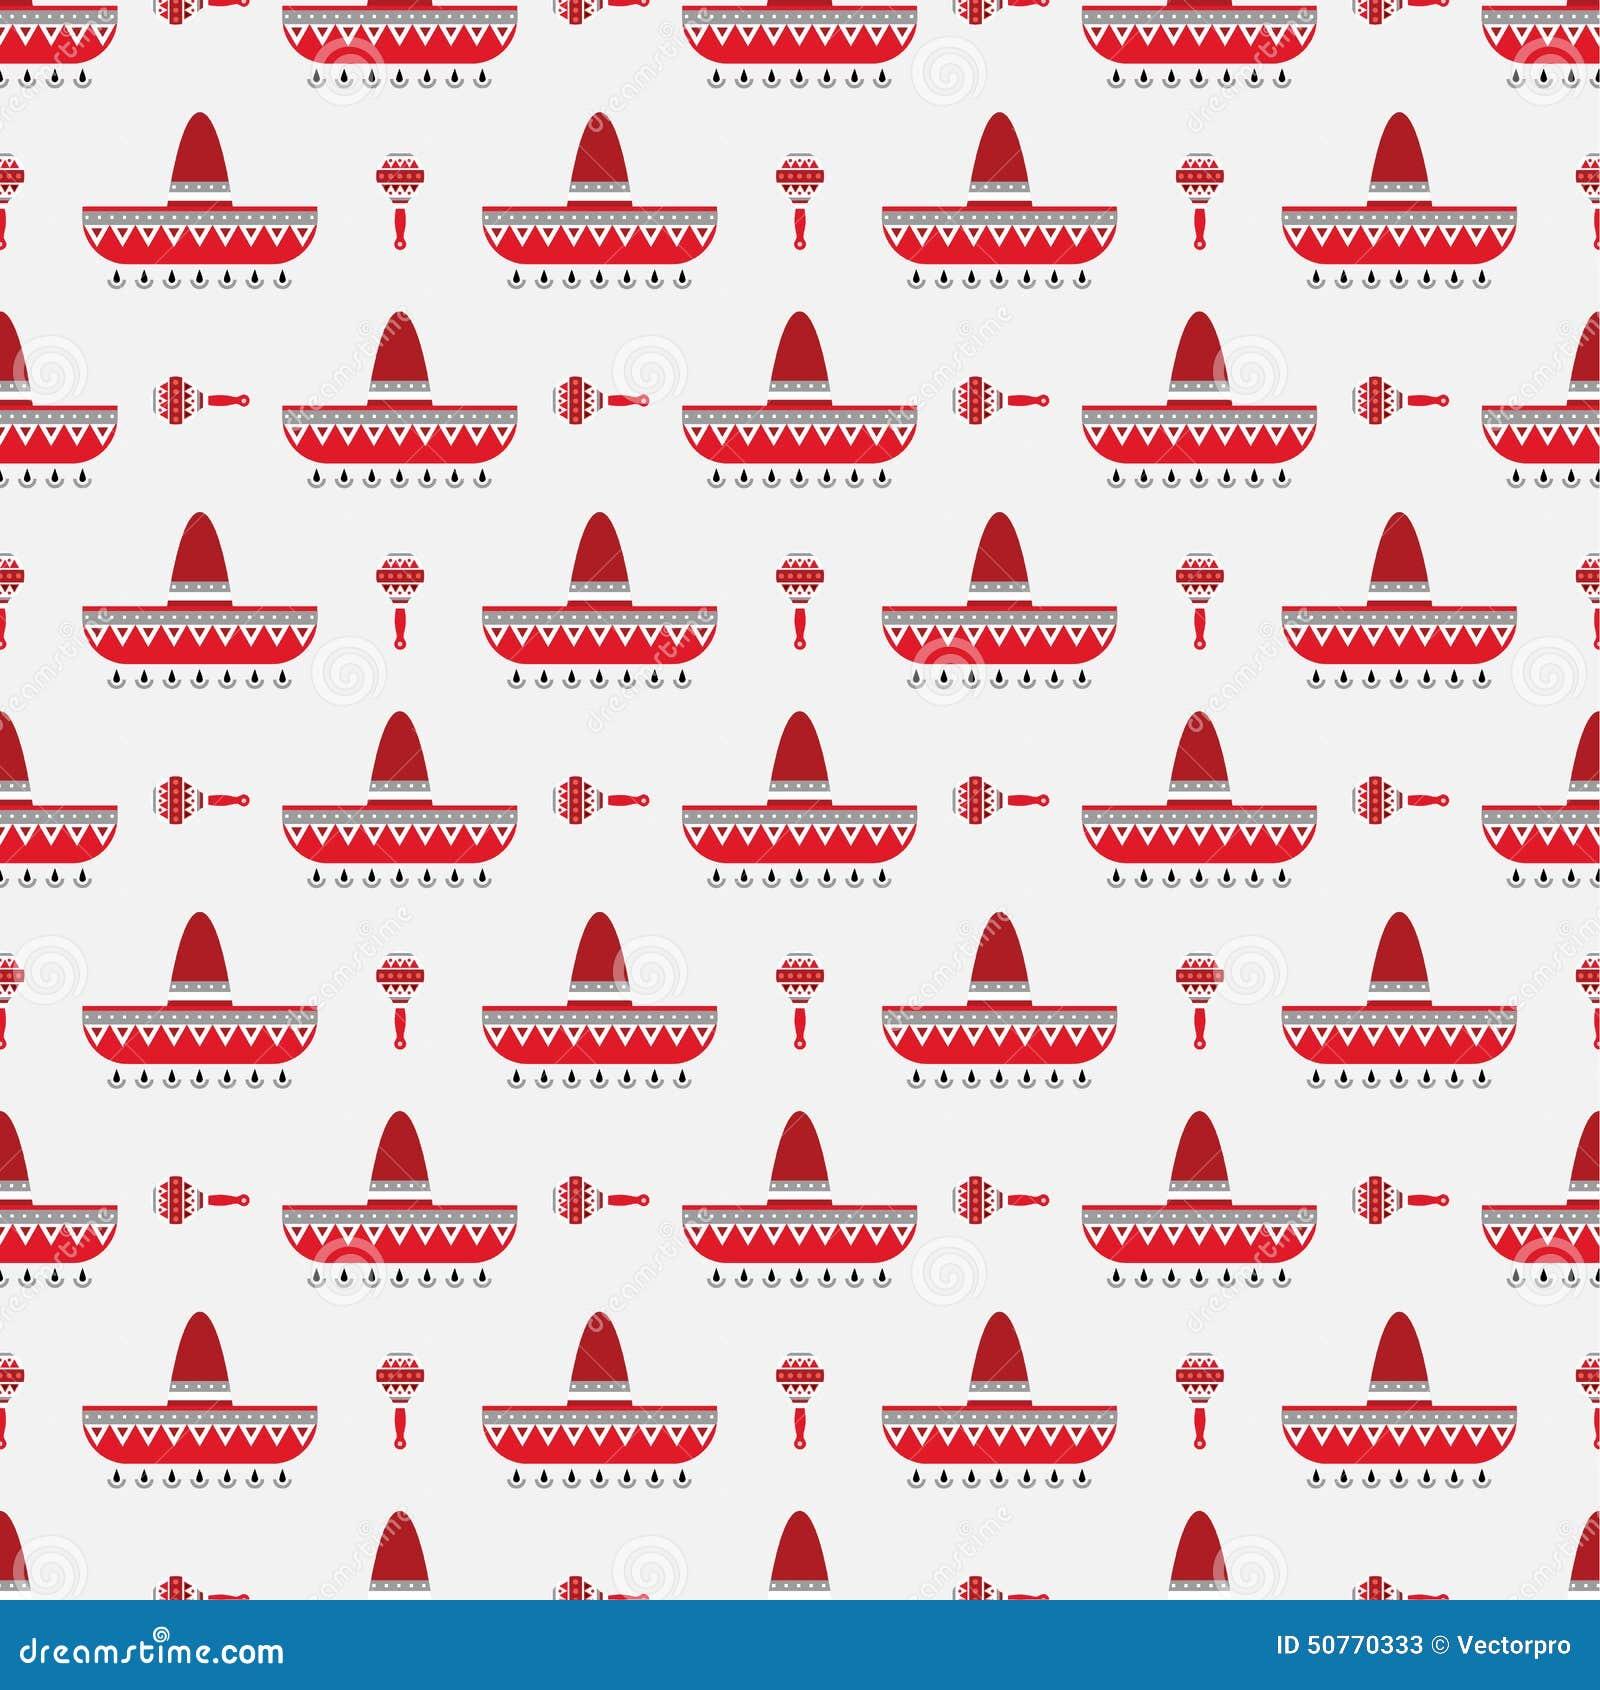 Sombrero And Maracas Pattern Stock Vector - Illustration of outline ... 1b50f203cd7